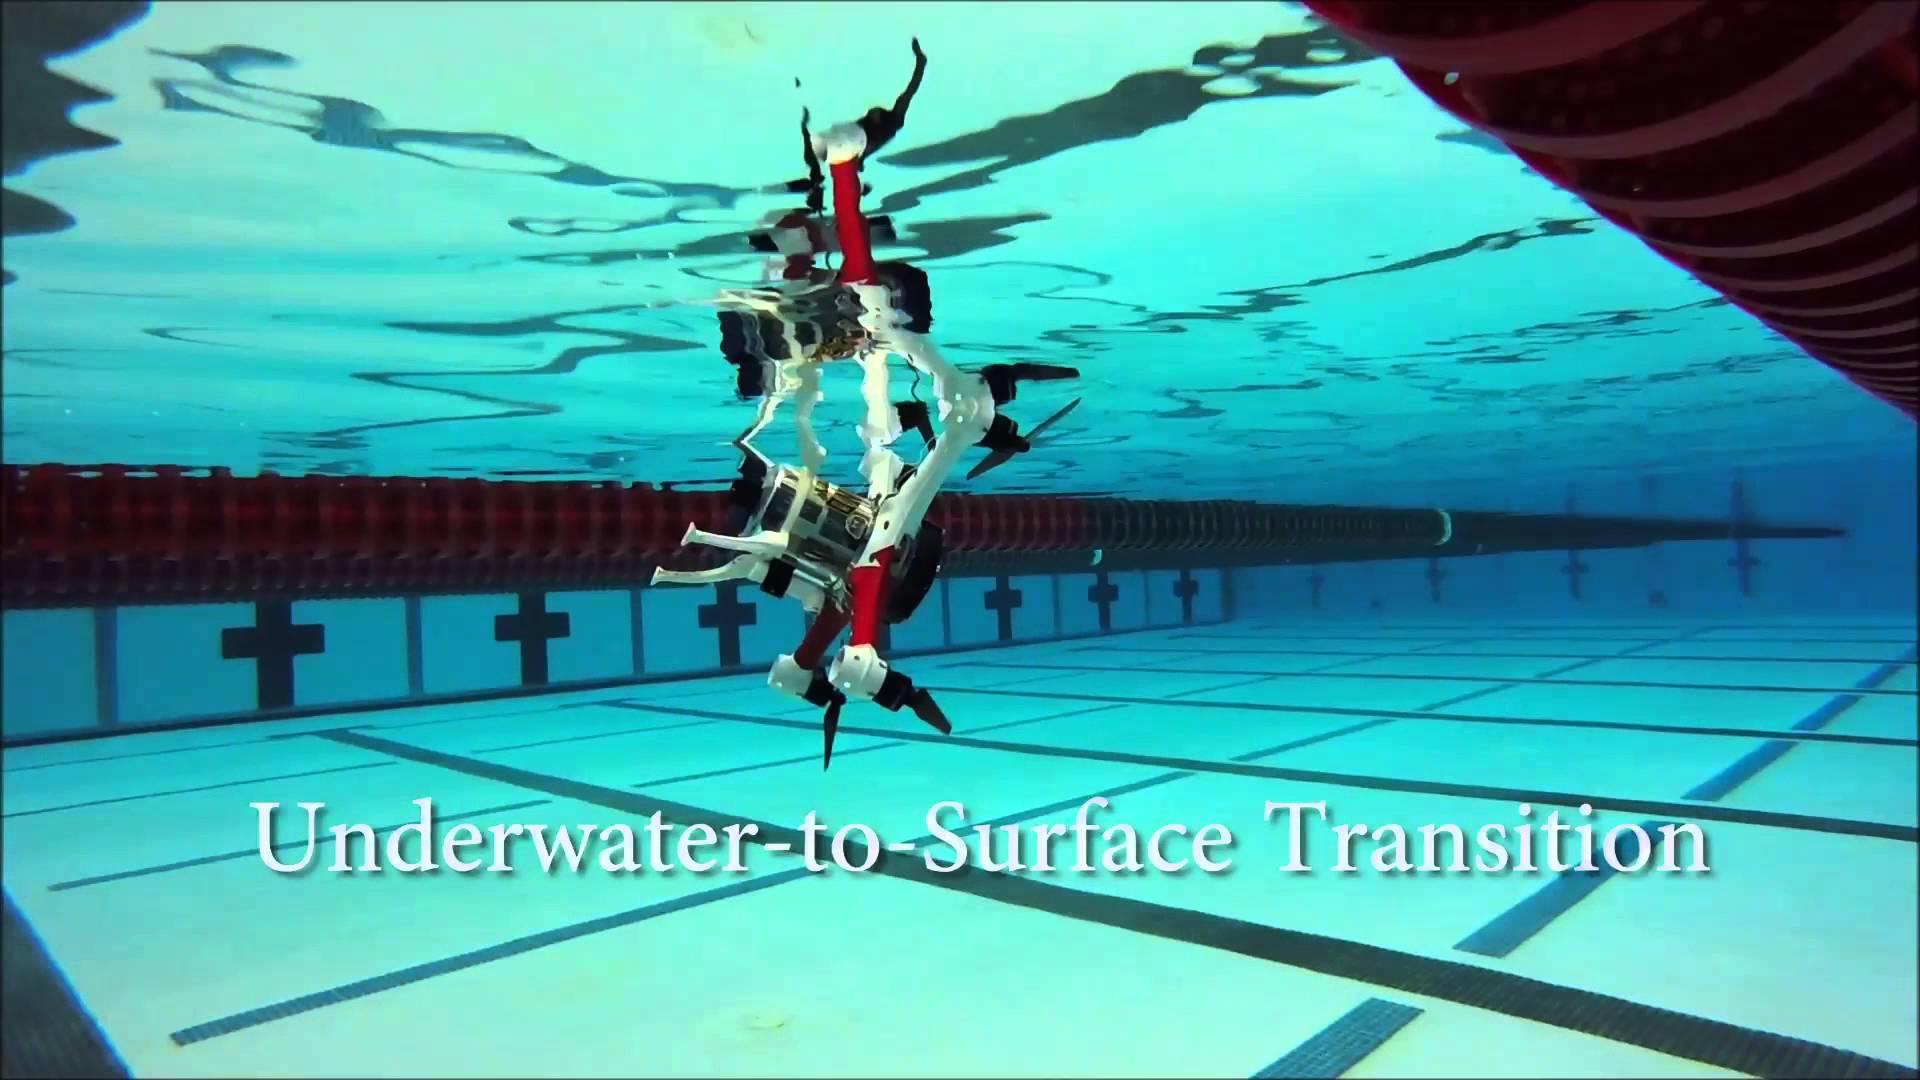 Loon Copter, Drone yang Dapat Menyelam di Air!